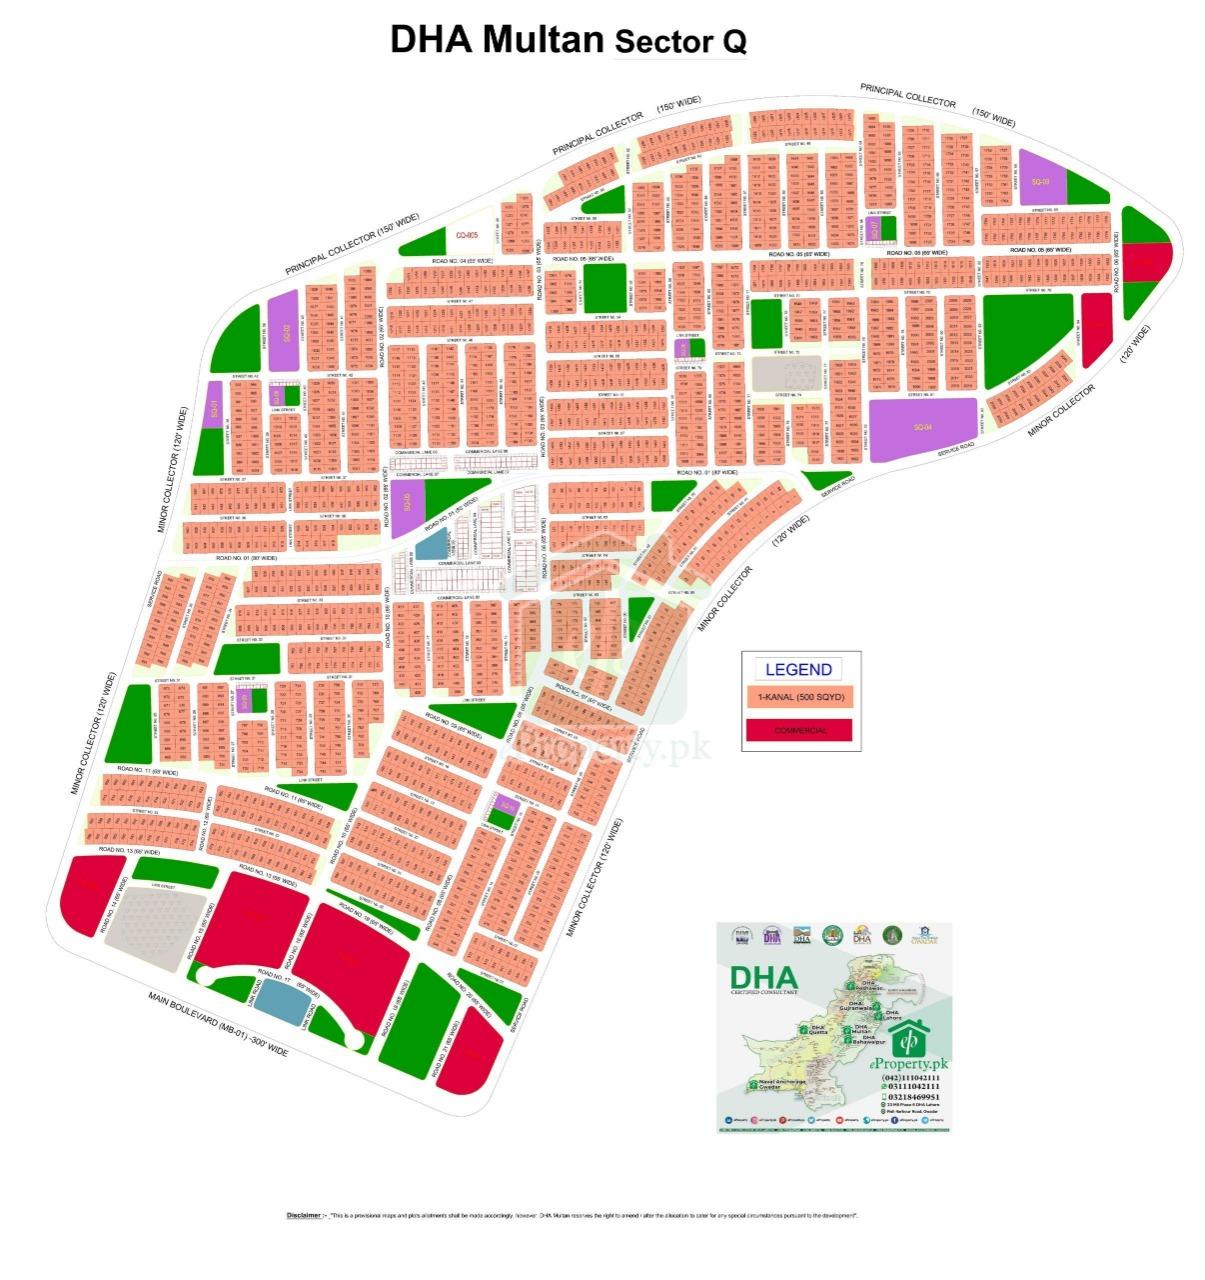 Q 1880 Good Location Plot in 1 Kanal in DHA Multan